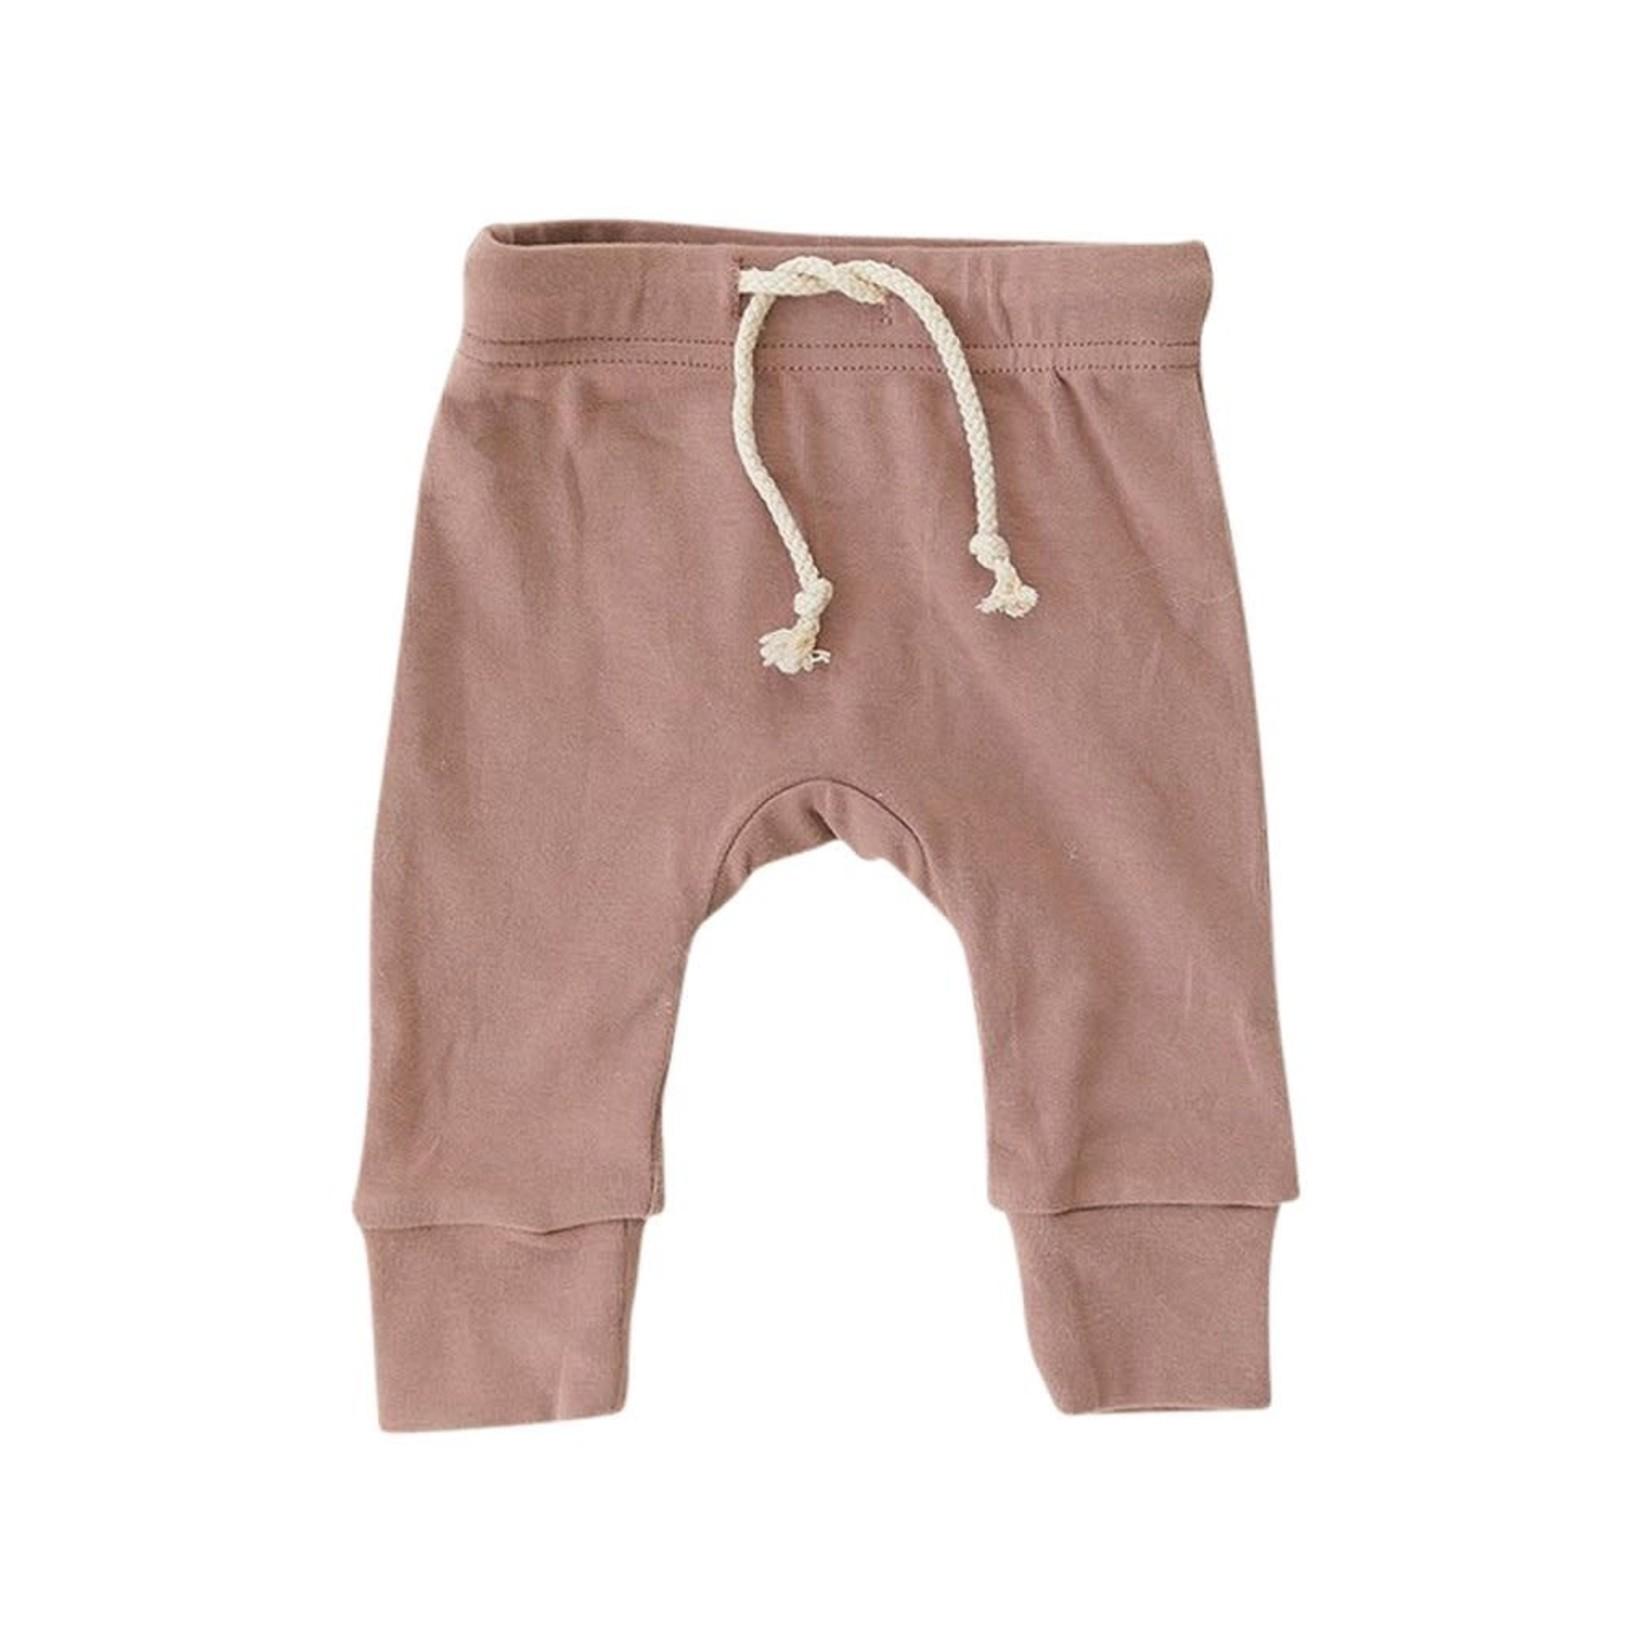 Mebie Baby Cotton Blush Jogger Pants 18M